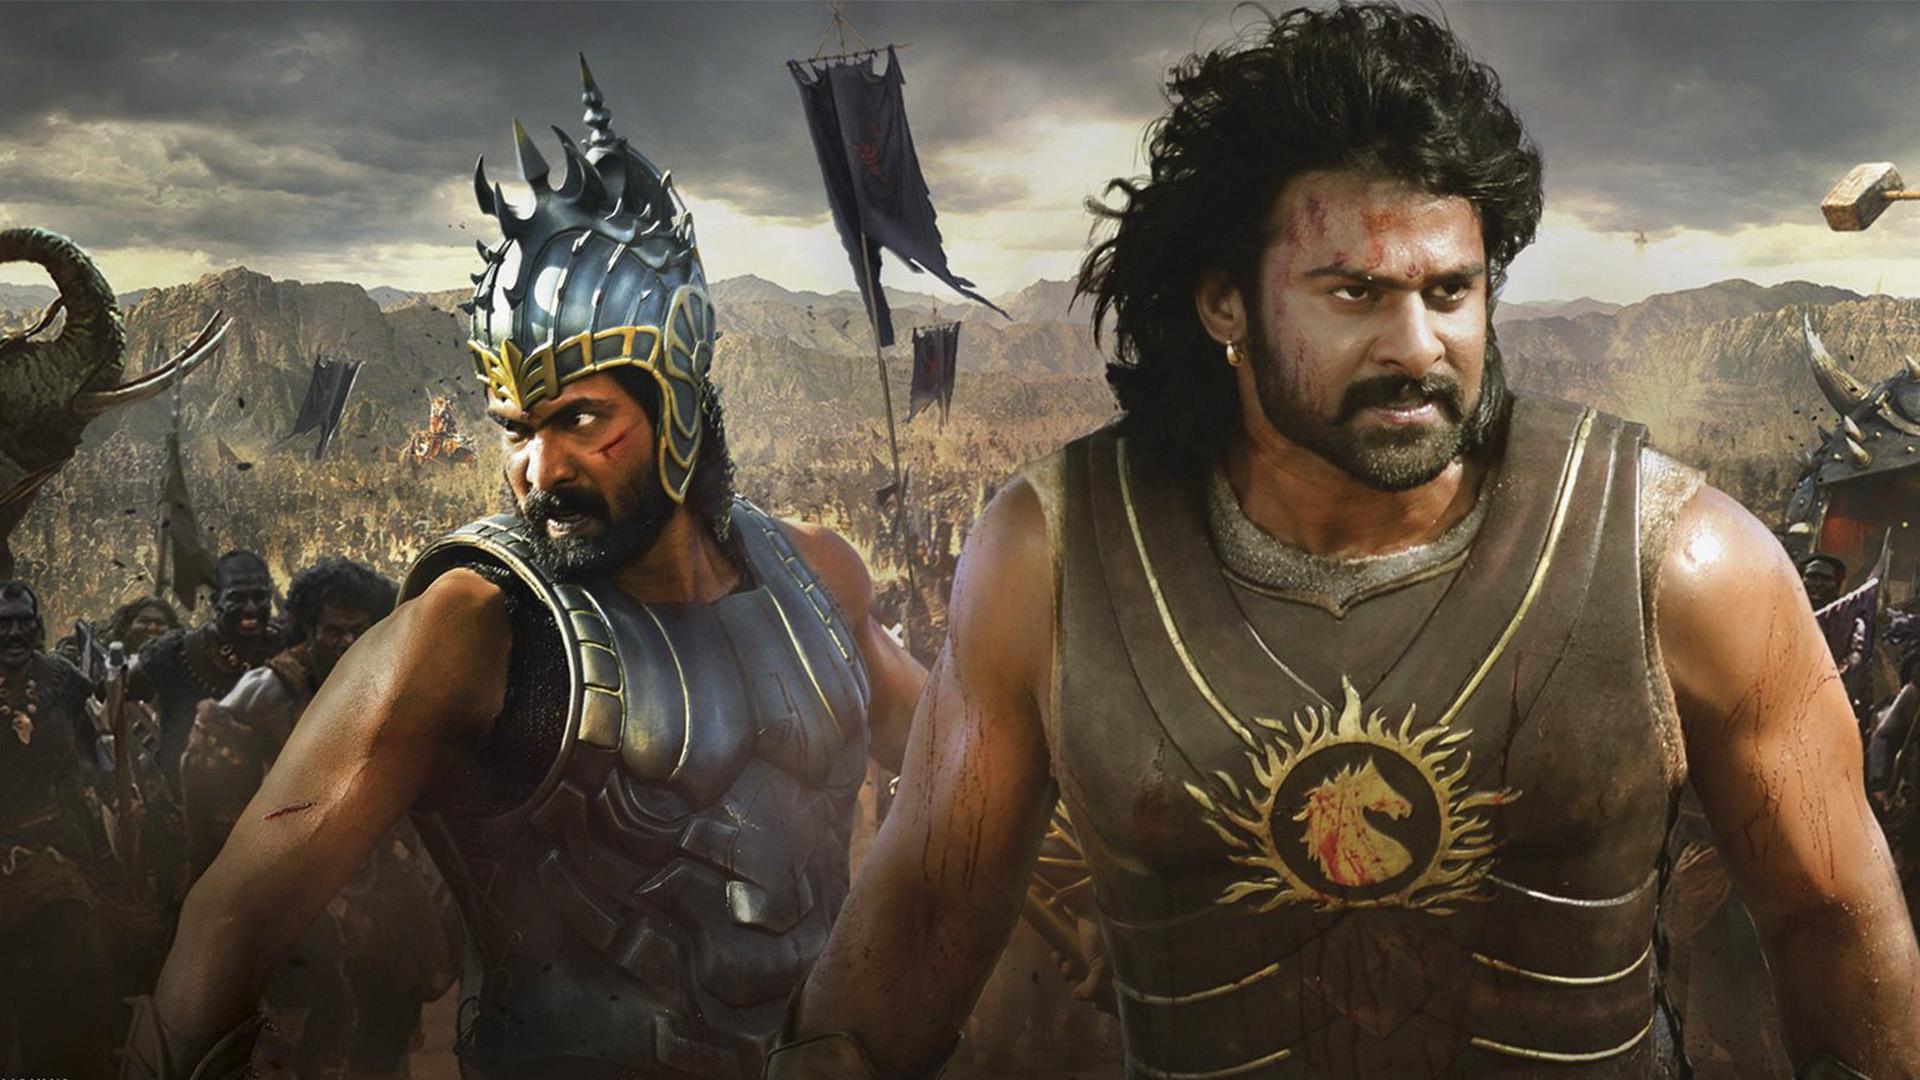 Mythology Makes A Comeback On The Big Screen